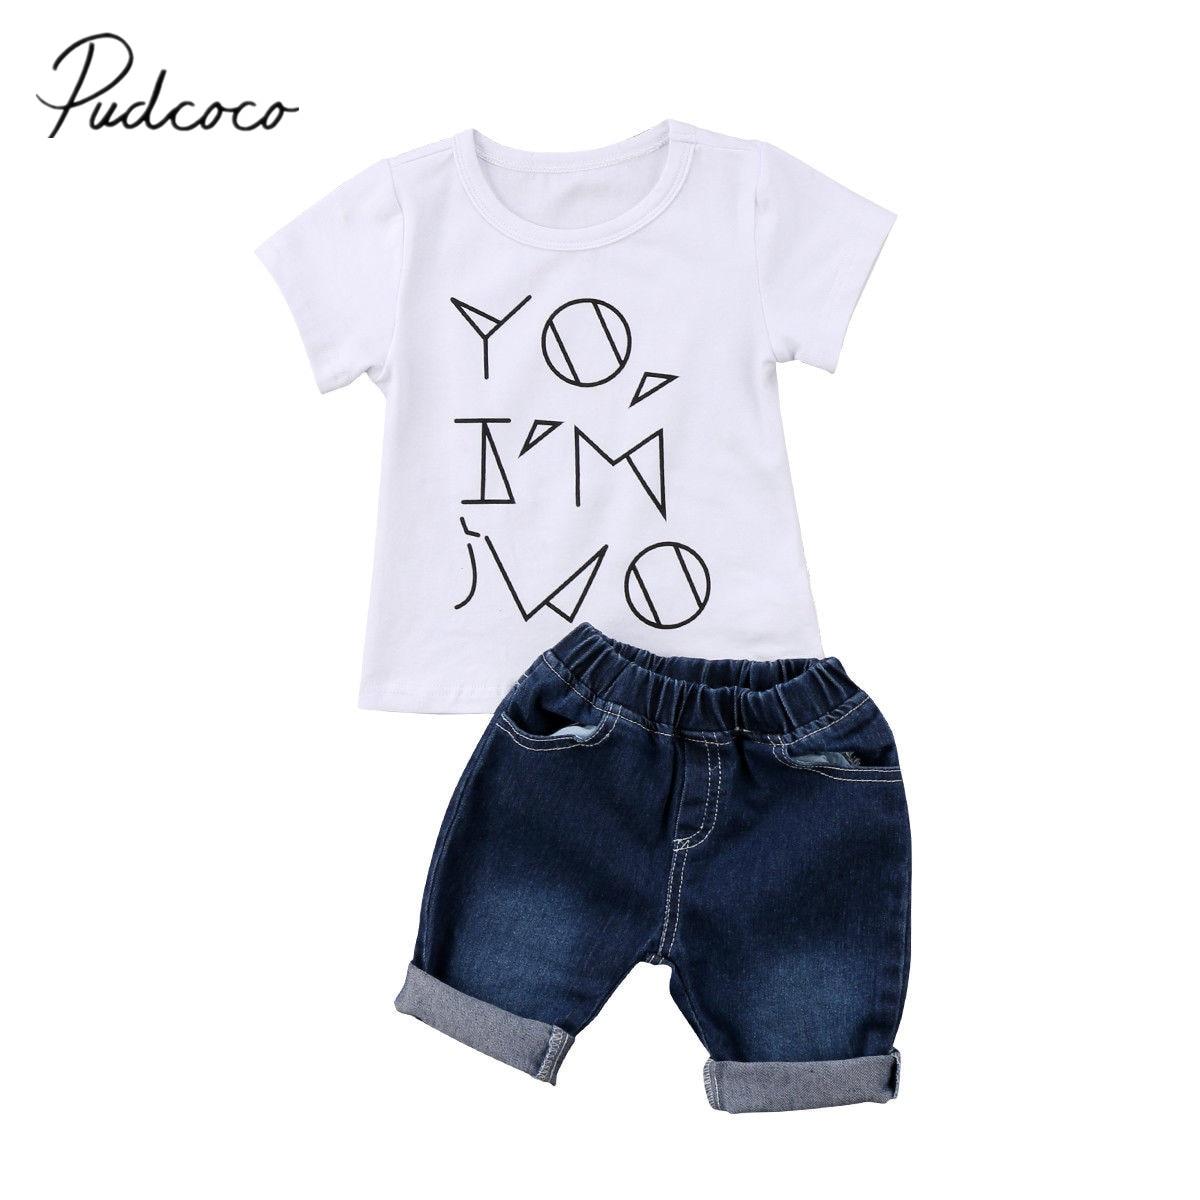 2018 Brand New Toddler Infant Child Kids Baby Boys Summer Clothes Shirt Short Jeans Pants 2PCS White T-shirt Casual set 6M-4T